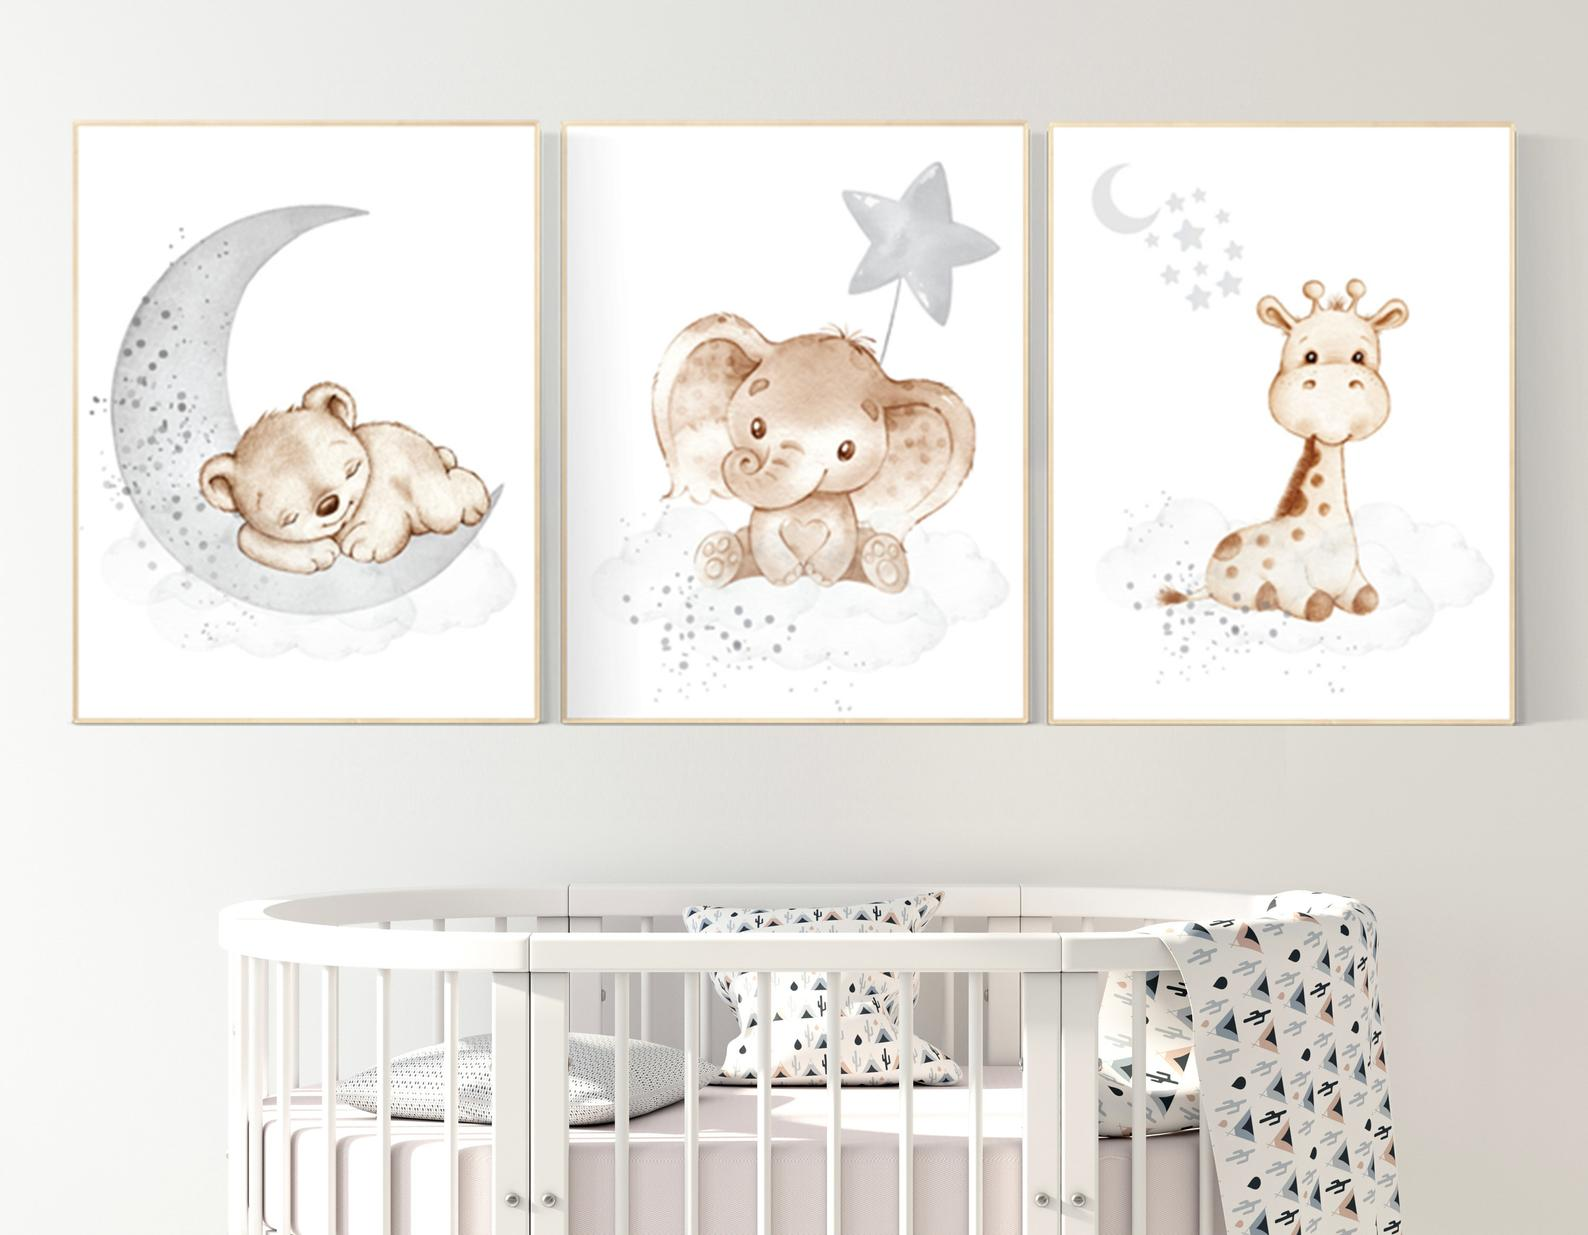 giraffe-gifts-nursery-wall-art